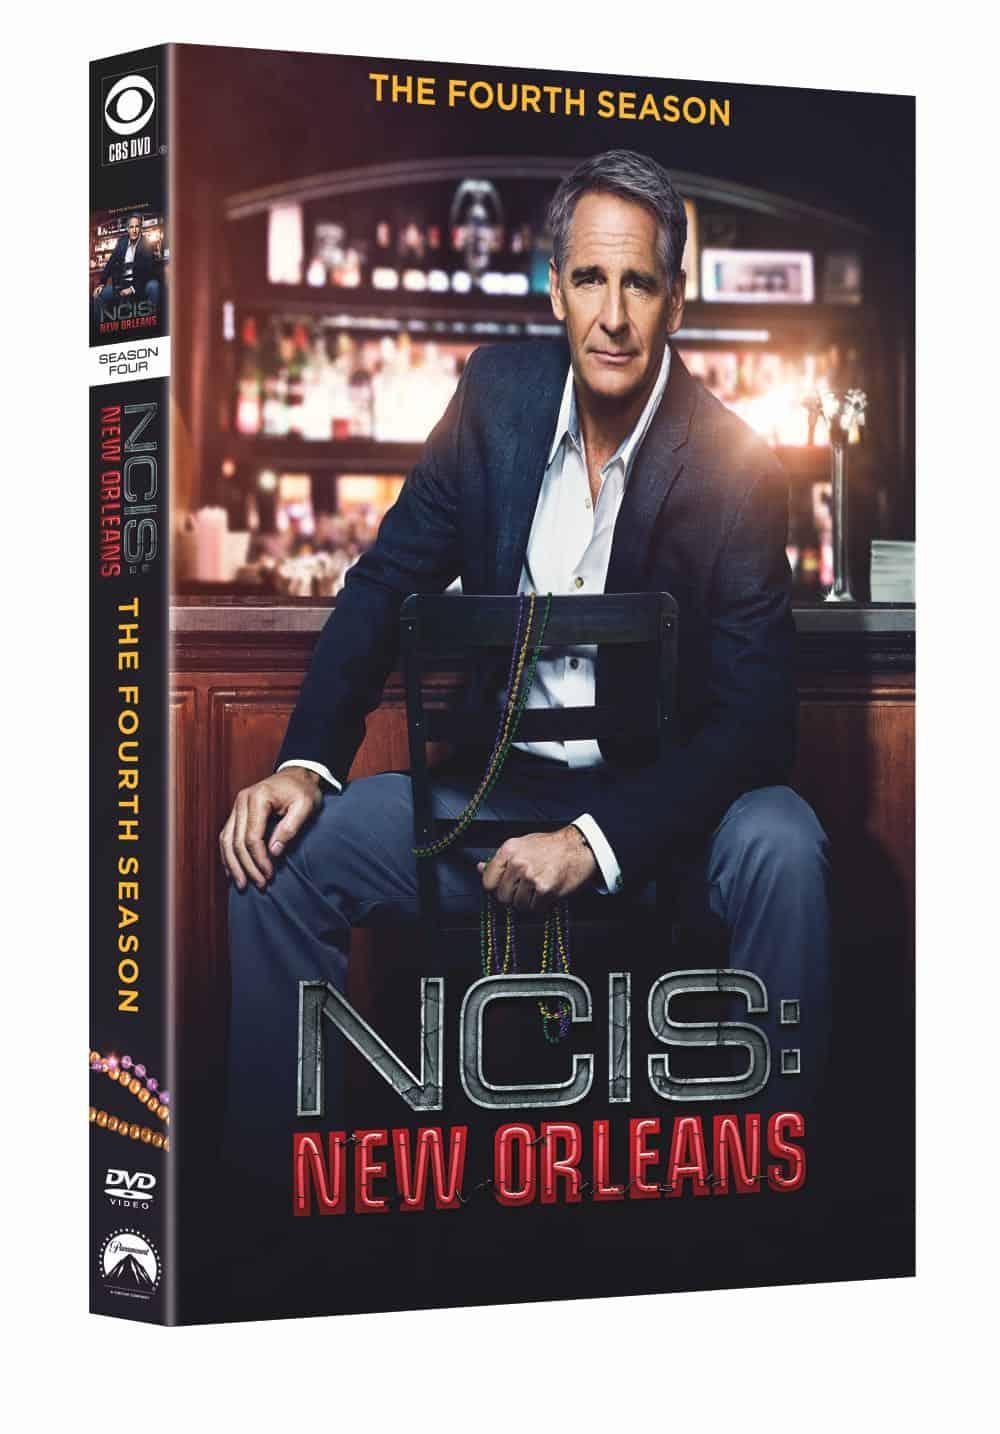 NCIS NEW ORLEANS Season 4 DVD Cover 3